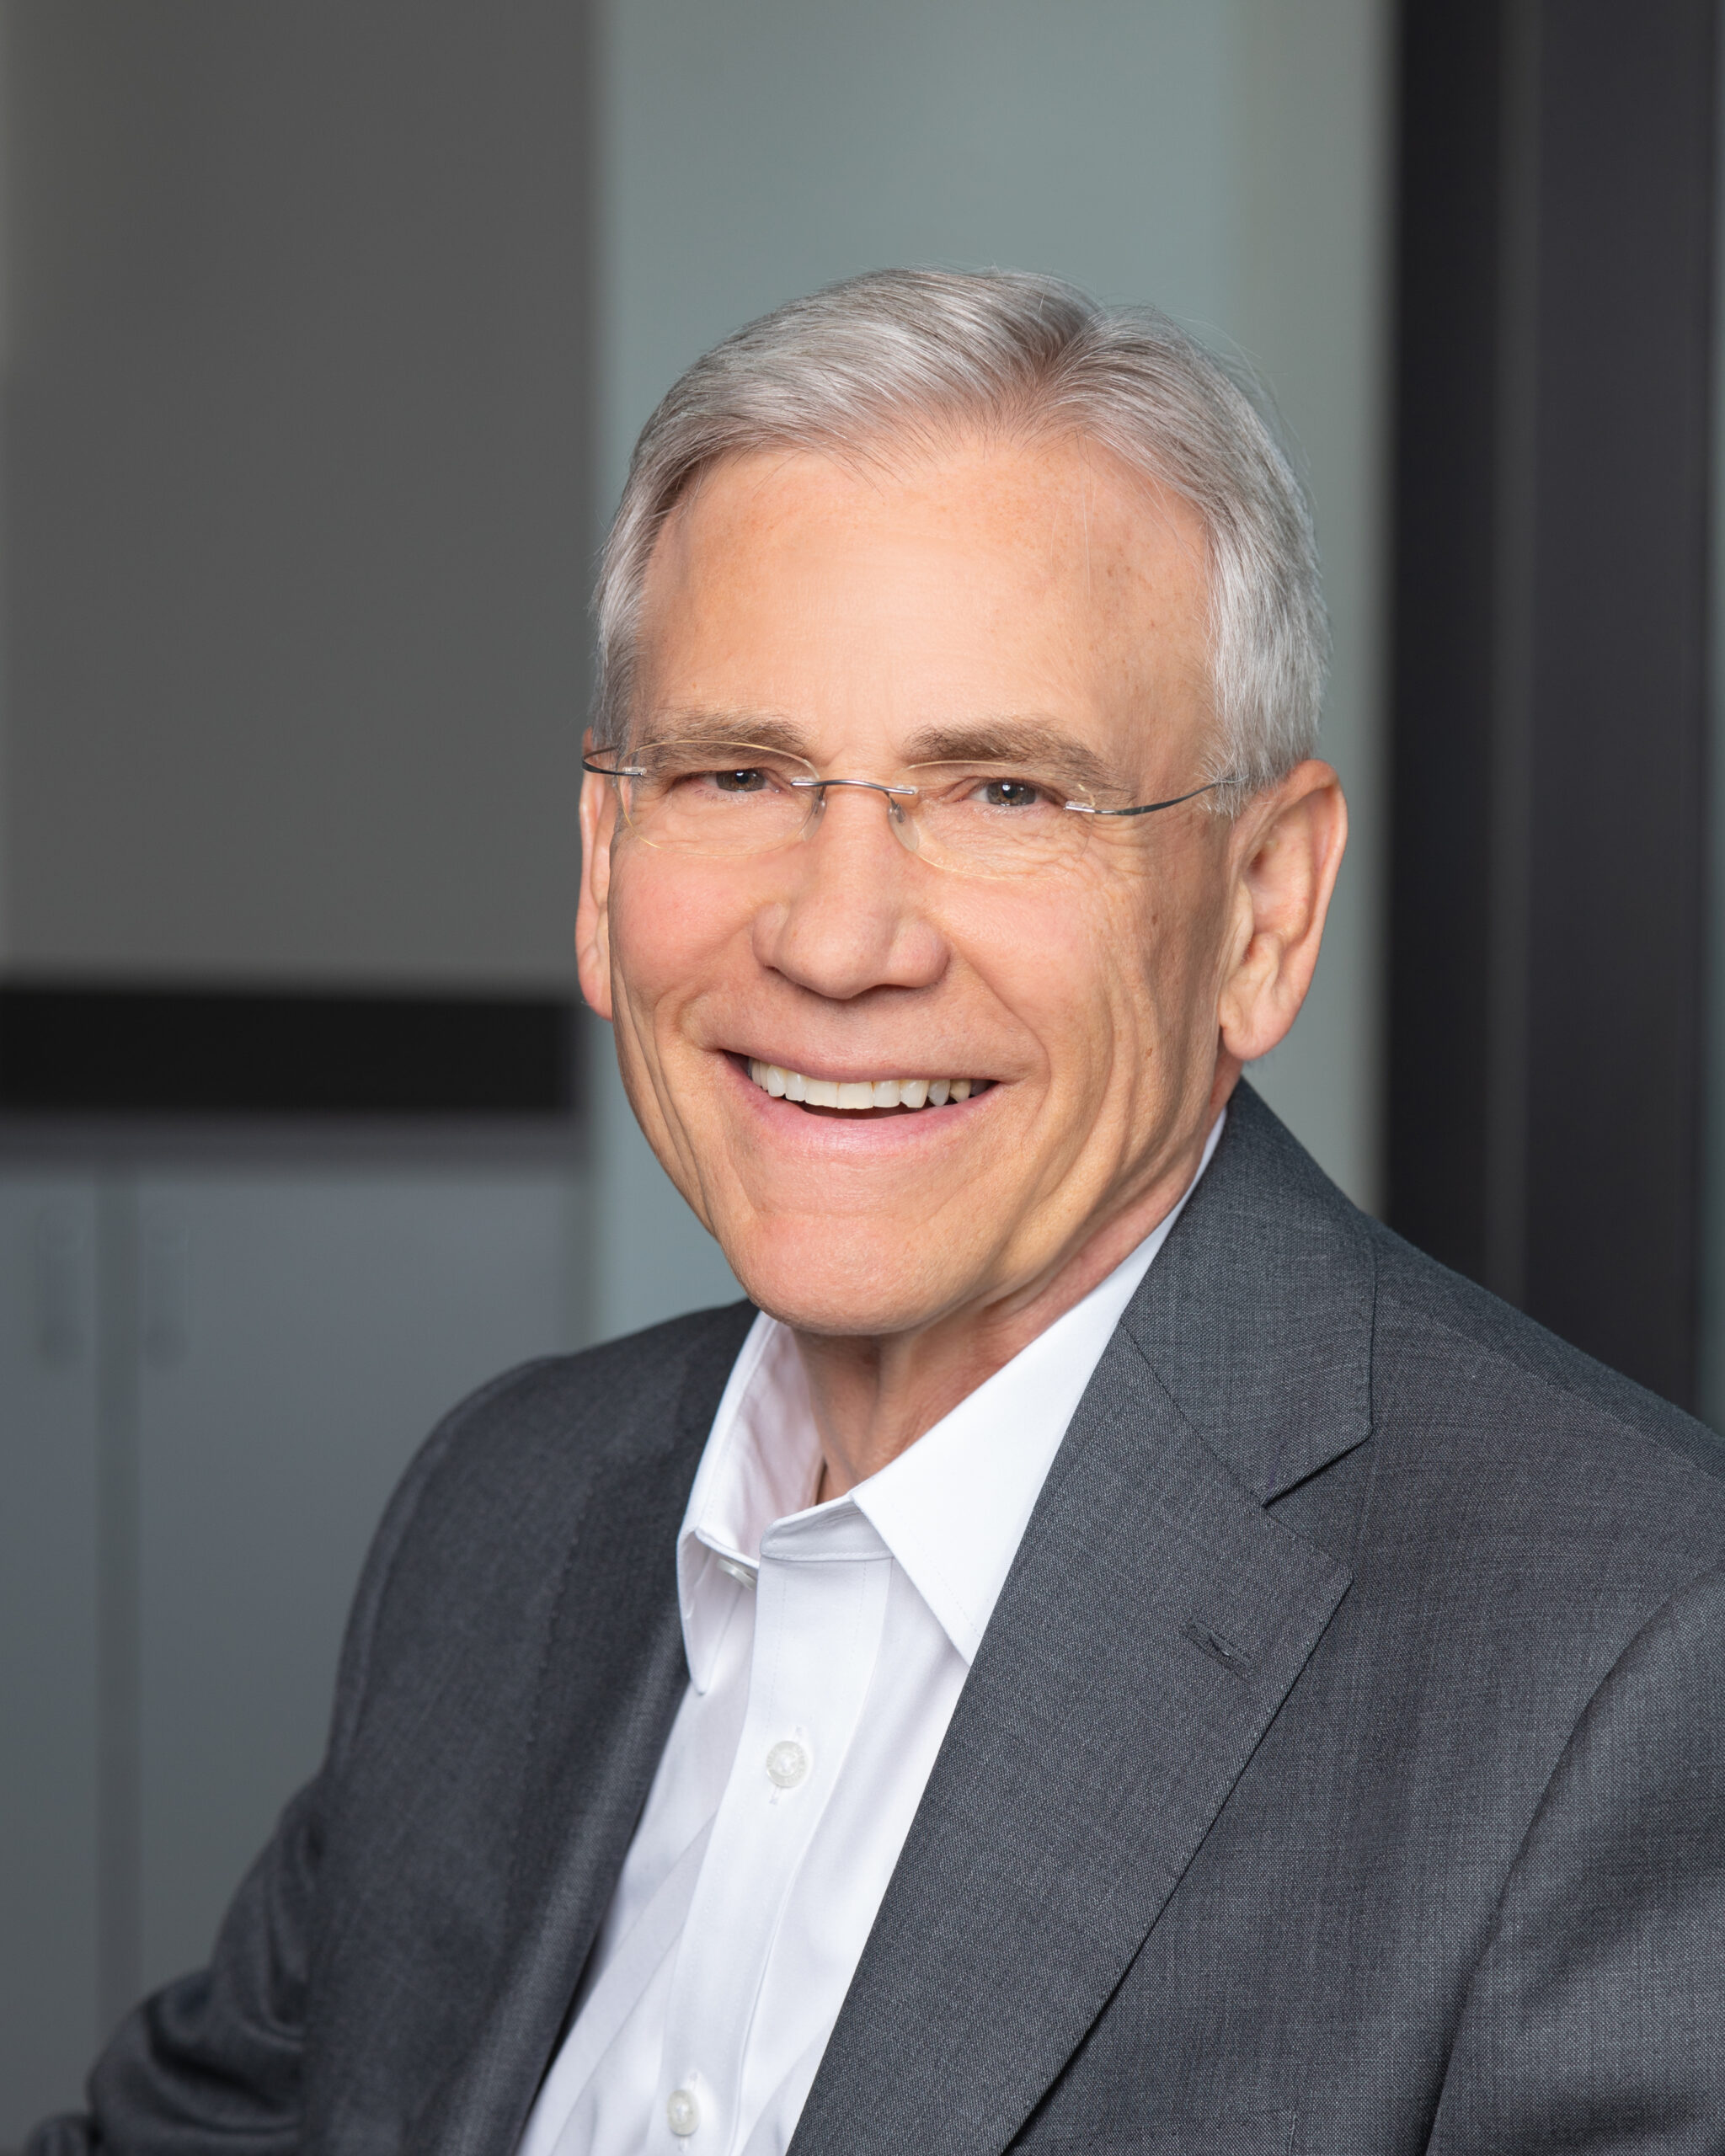 Gary Gessel - M&A Advisor